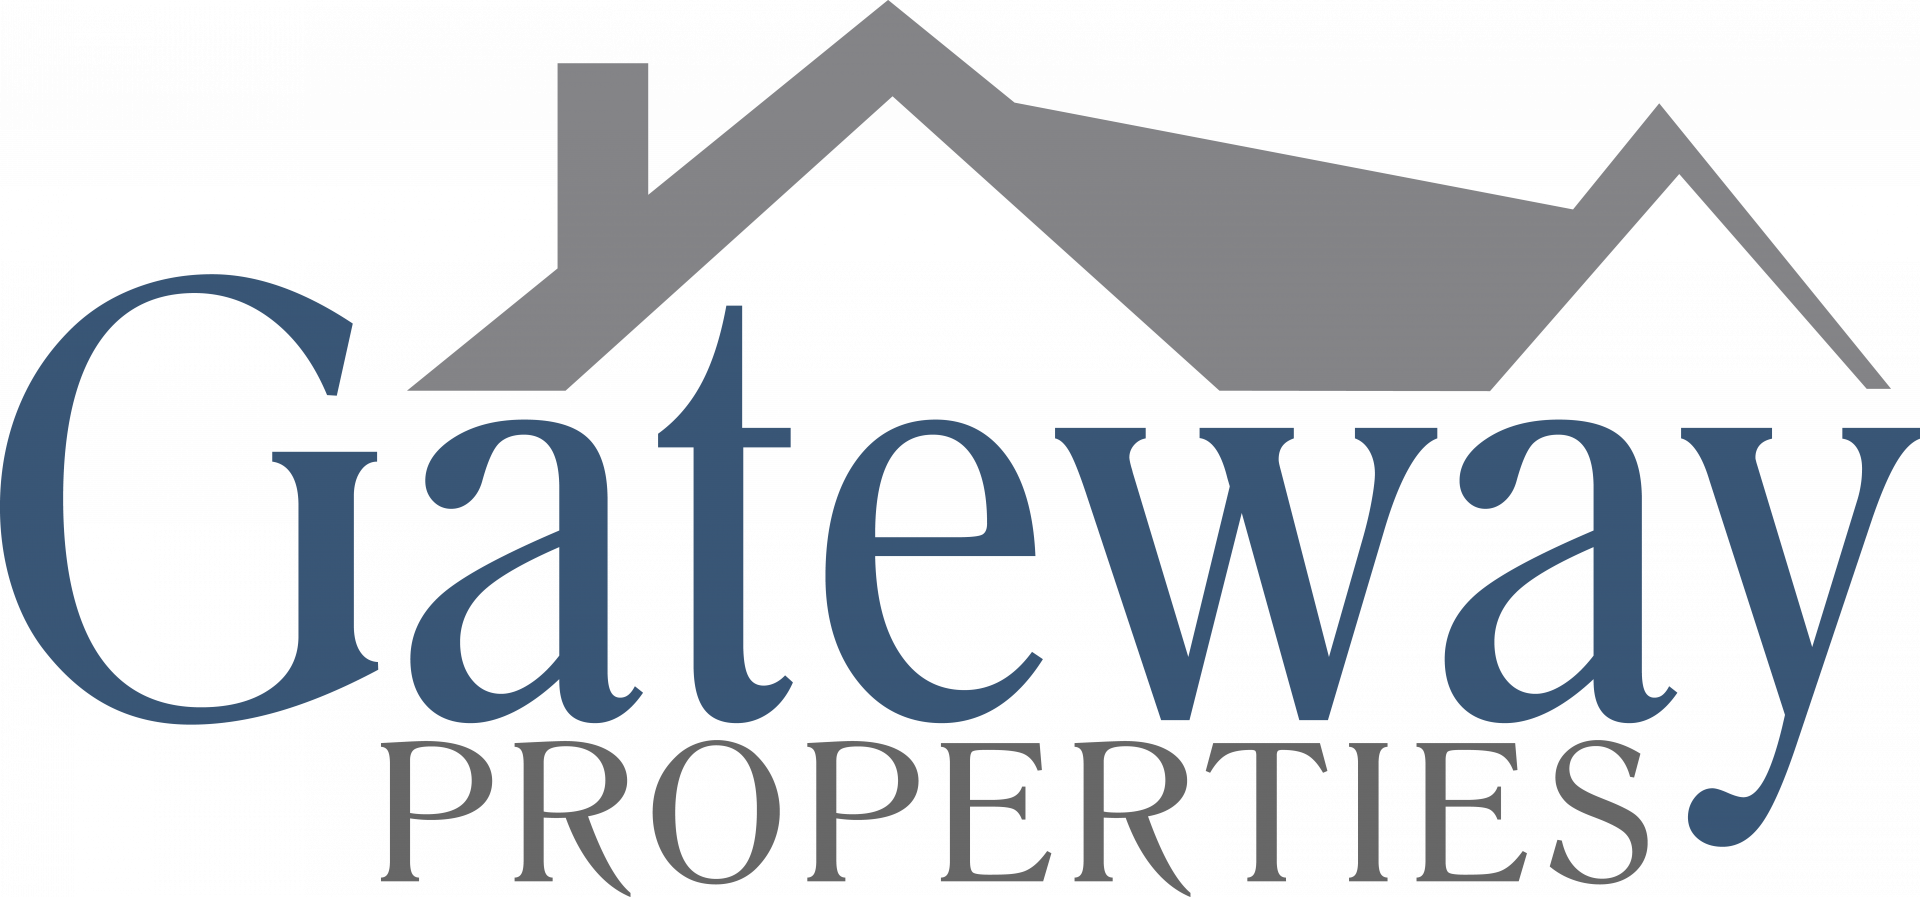 Julee Patterson logo